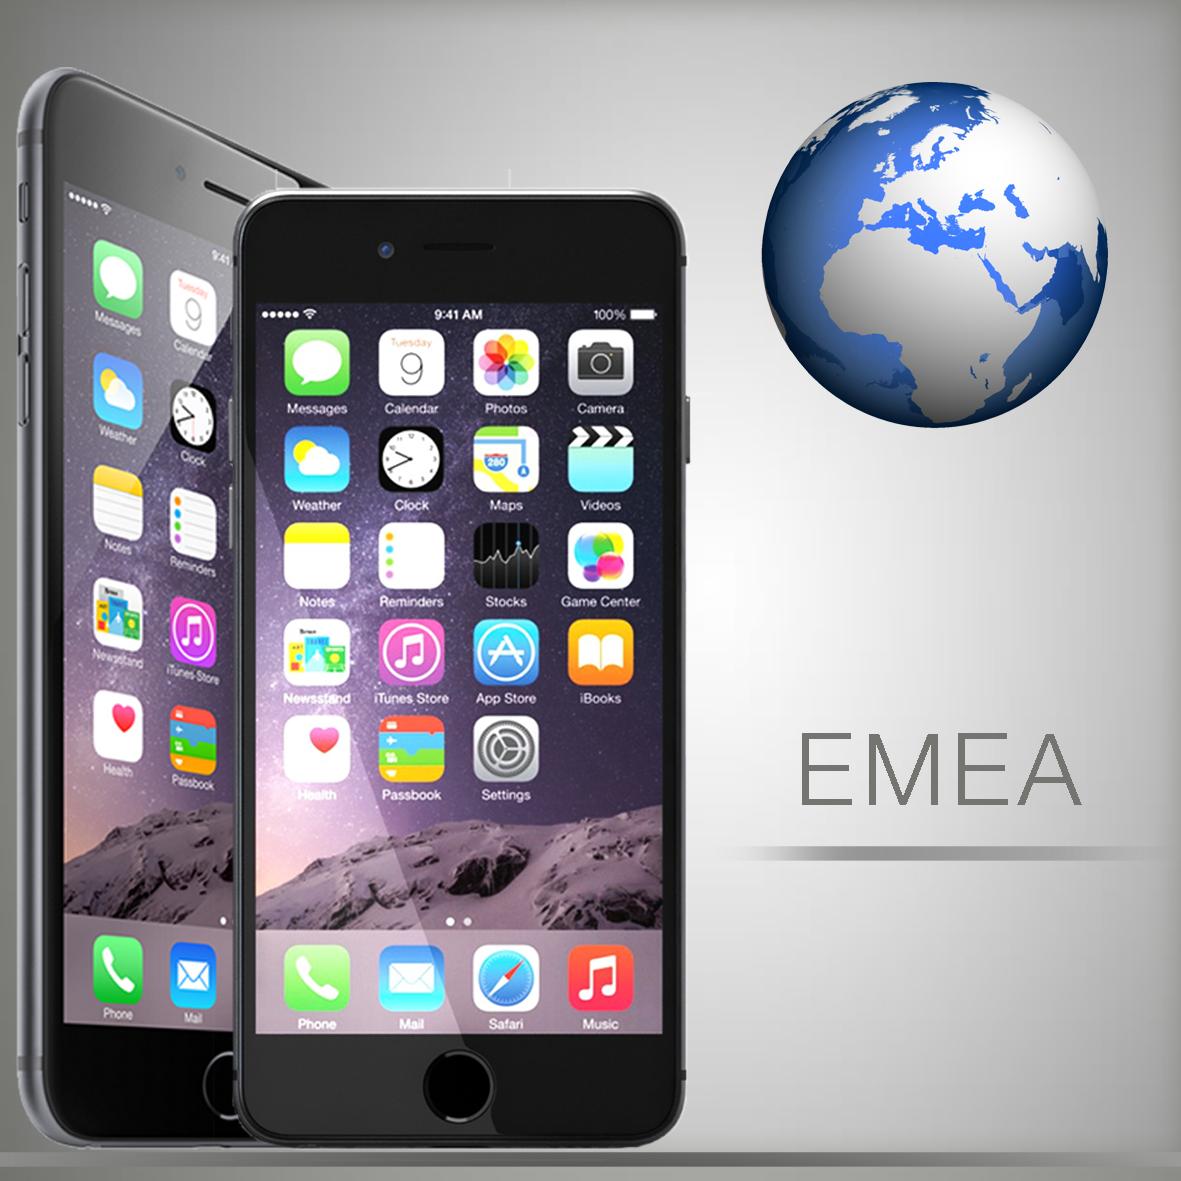 Unlock Emea Iphone How To Unlock Emea Iphone 6 Plus 6 5s 5c 5 4s 4